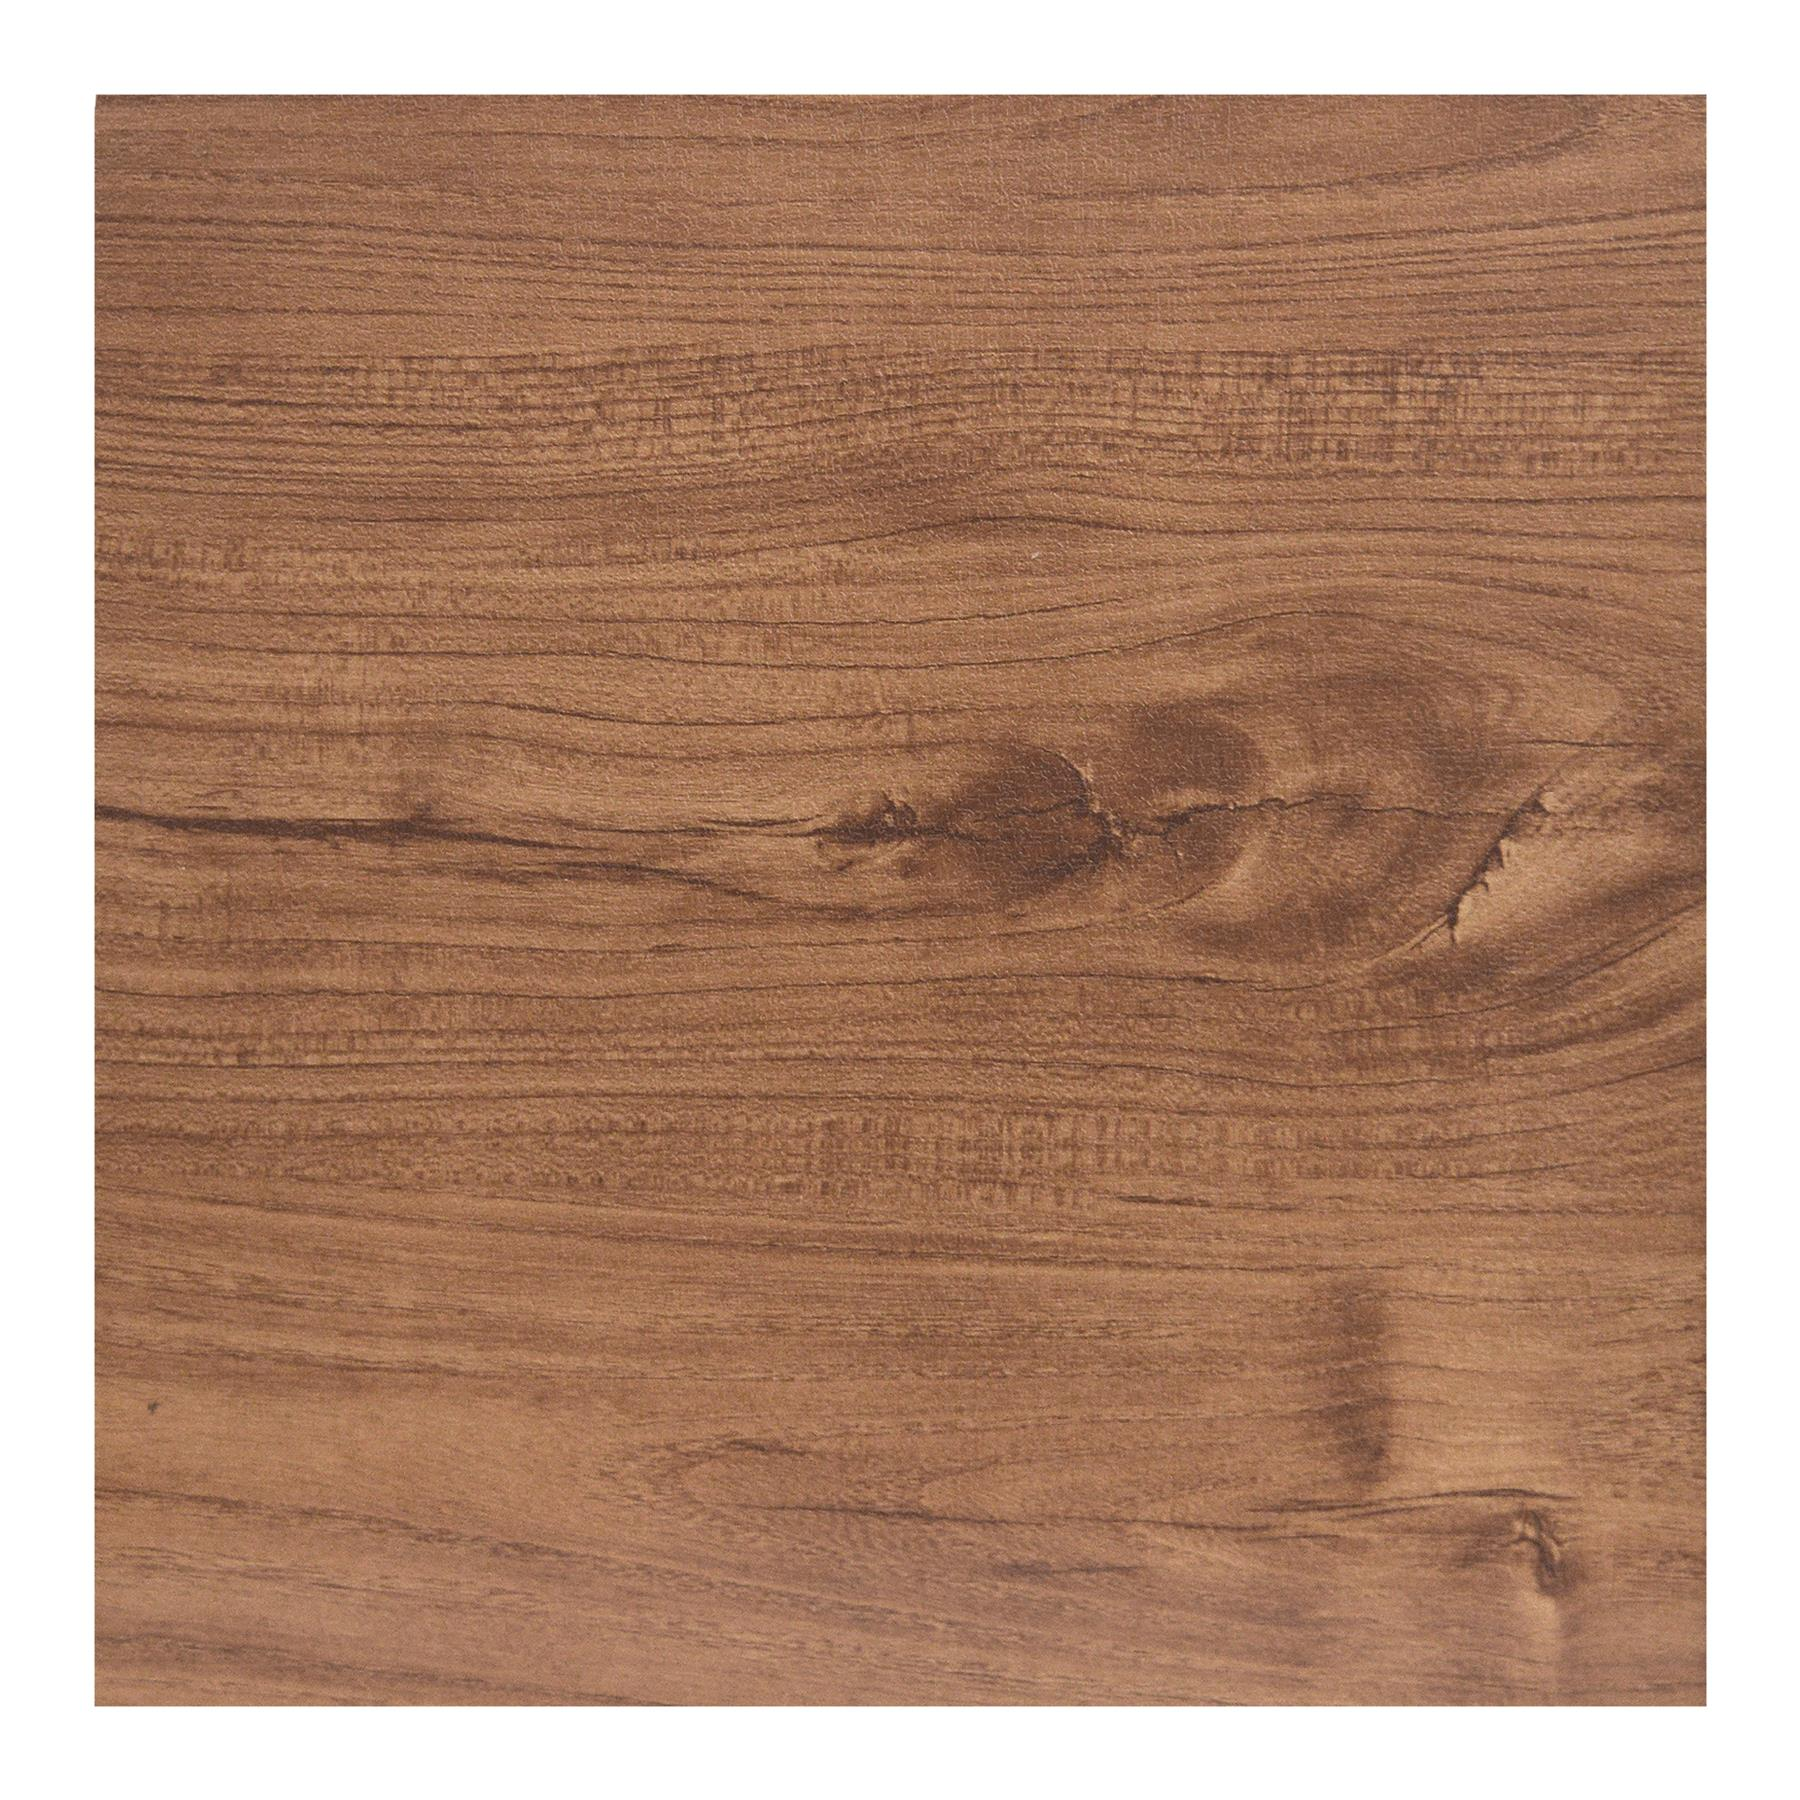 Floor-Tiles-Self-Adhesive-Vinyl-Flooring-Kitchen-Bathroom-Brown-Wood-Grain thumbnail 2